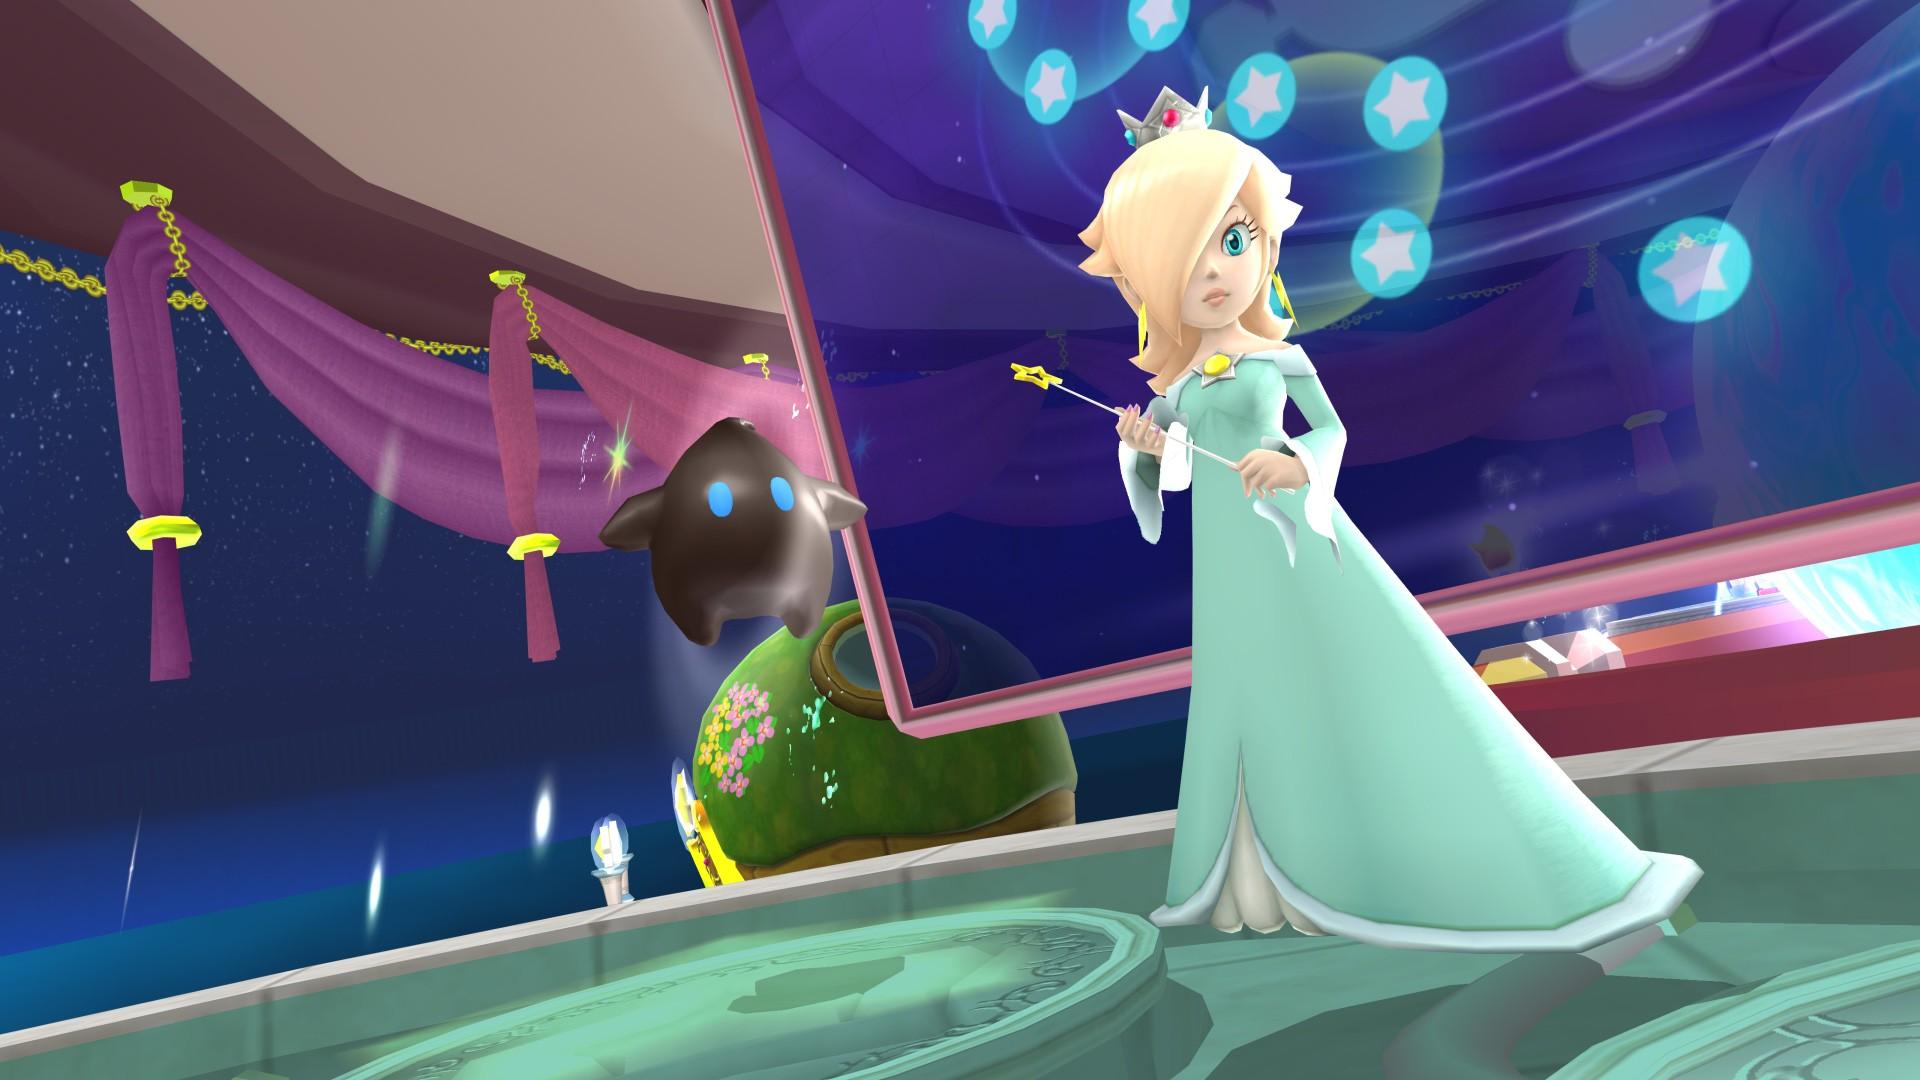 Wallpaper Luma Mario Bros Character Princess Rosalina Mario Series Super Mario Galaxy 1920x1080 Djdeejay 1843857 Hd Wallpapers Wallhere